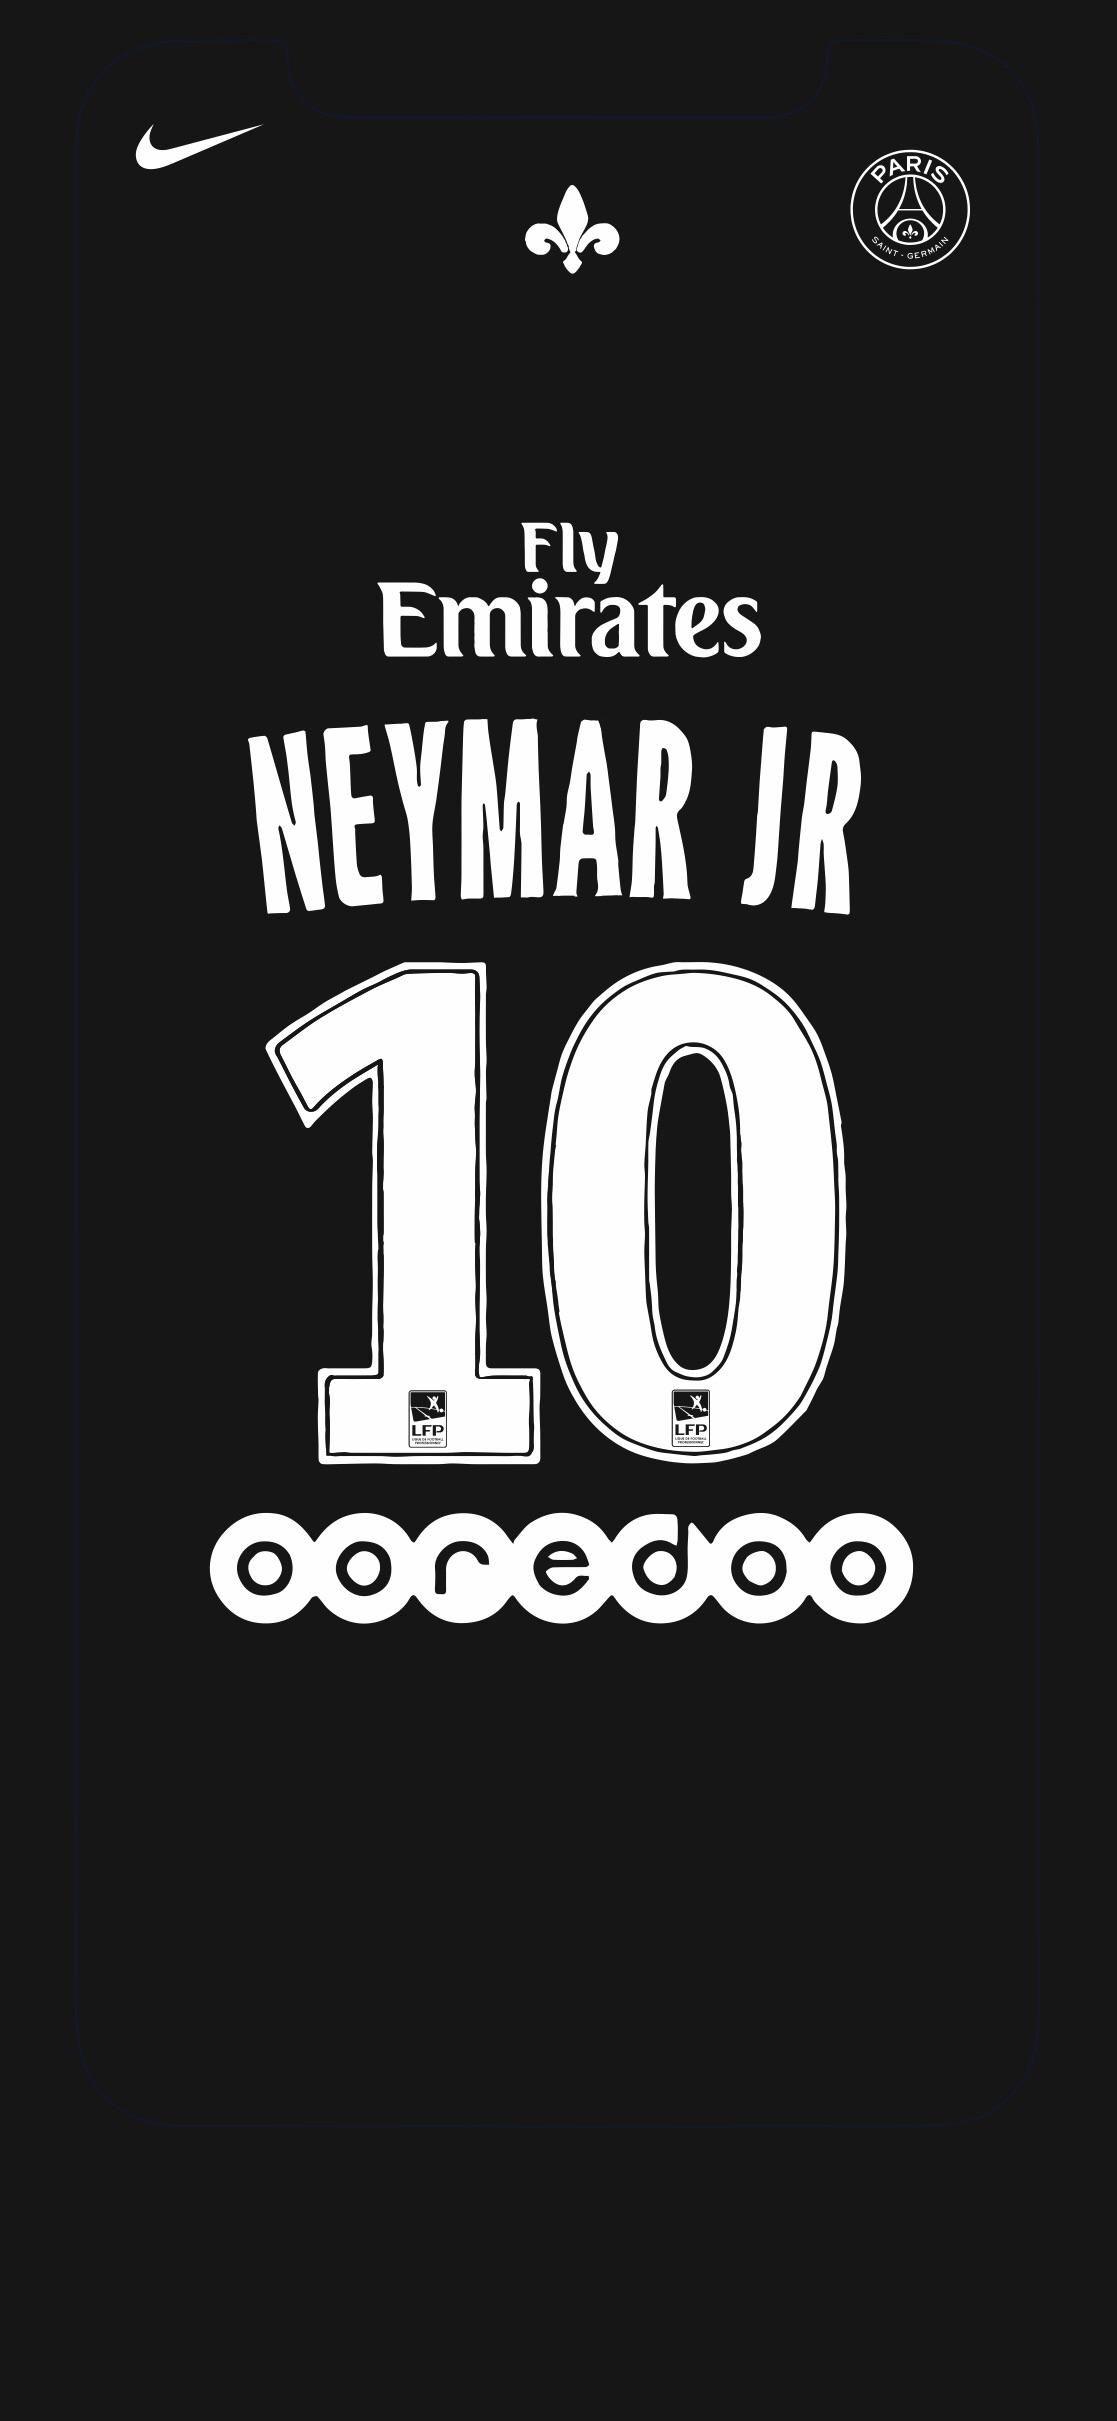 neymar jr iphone x wallpapers